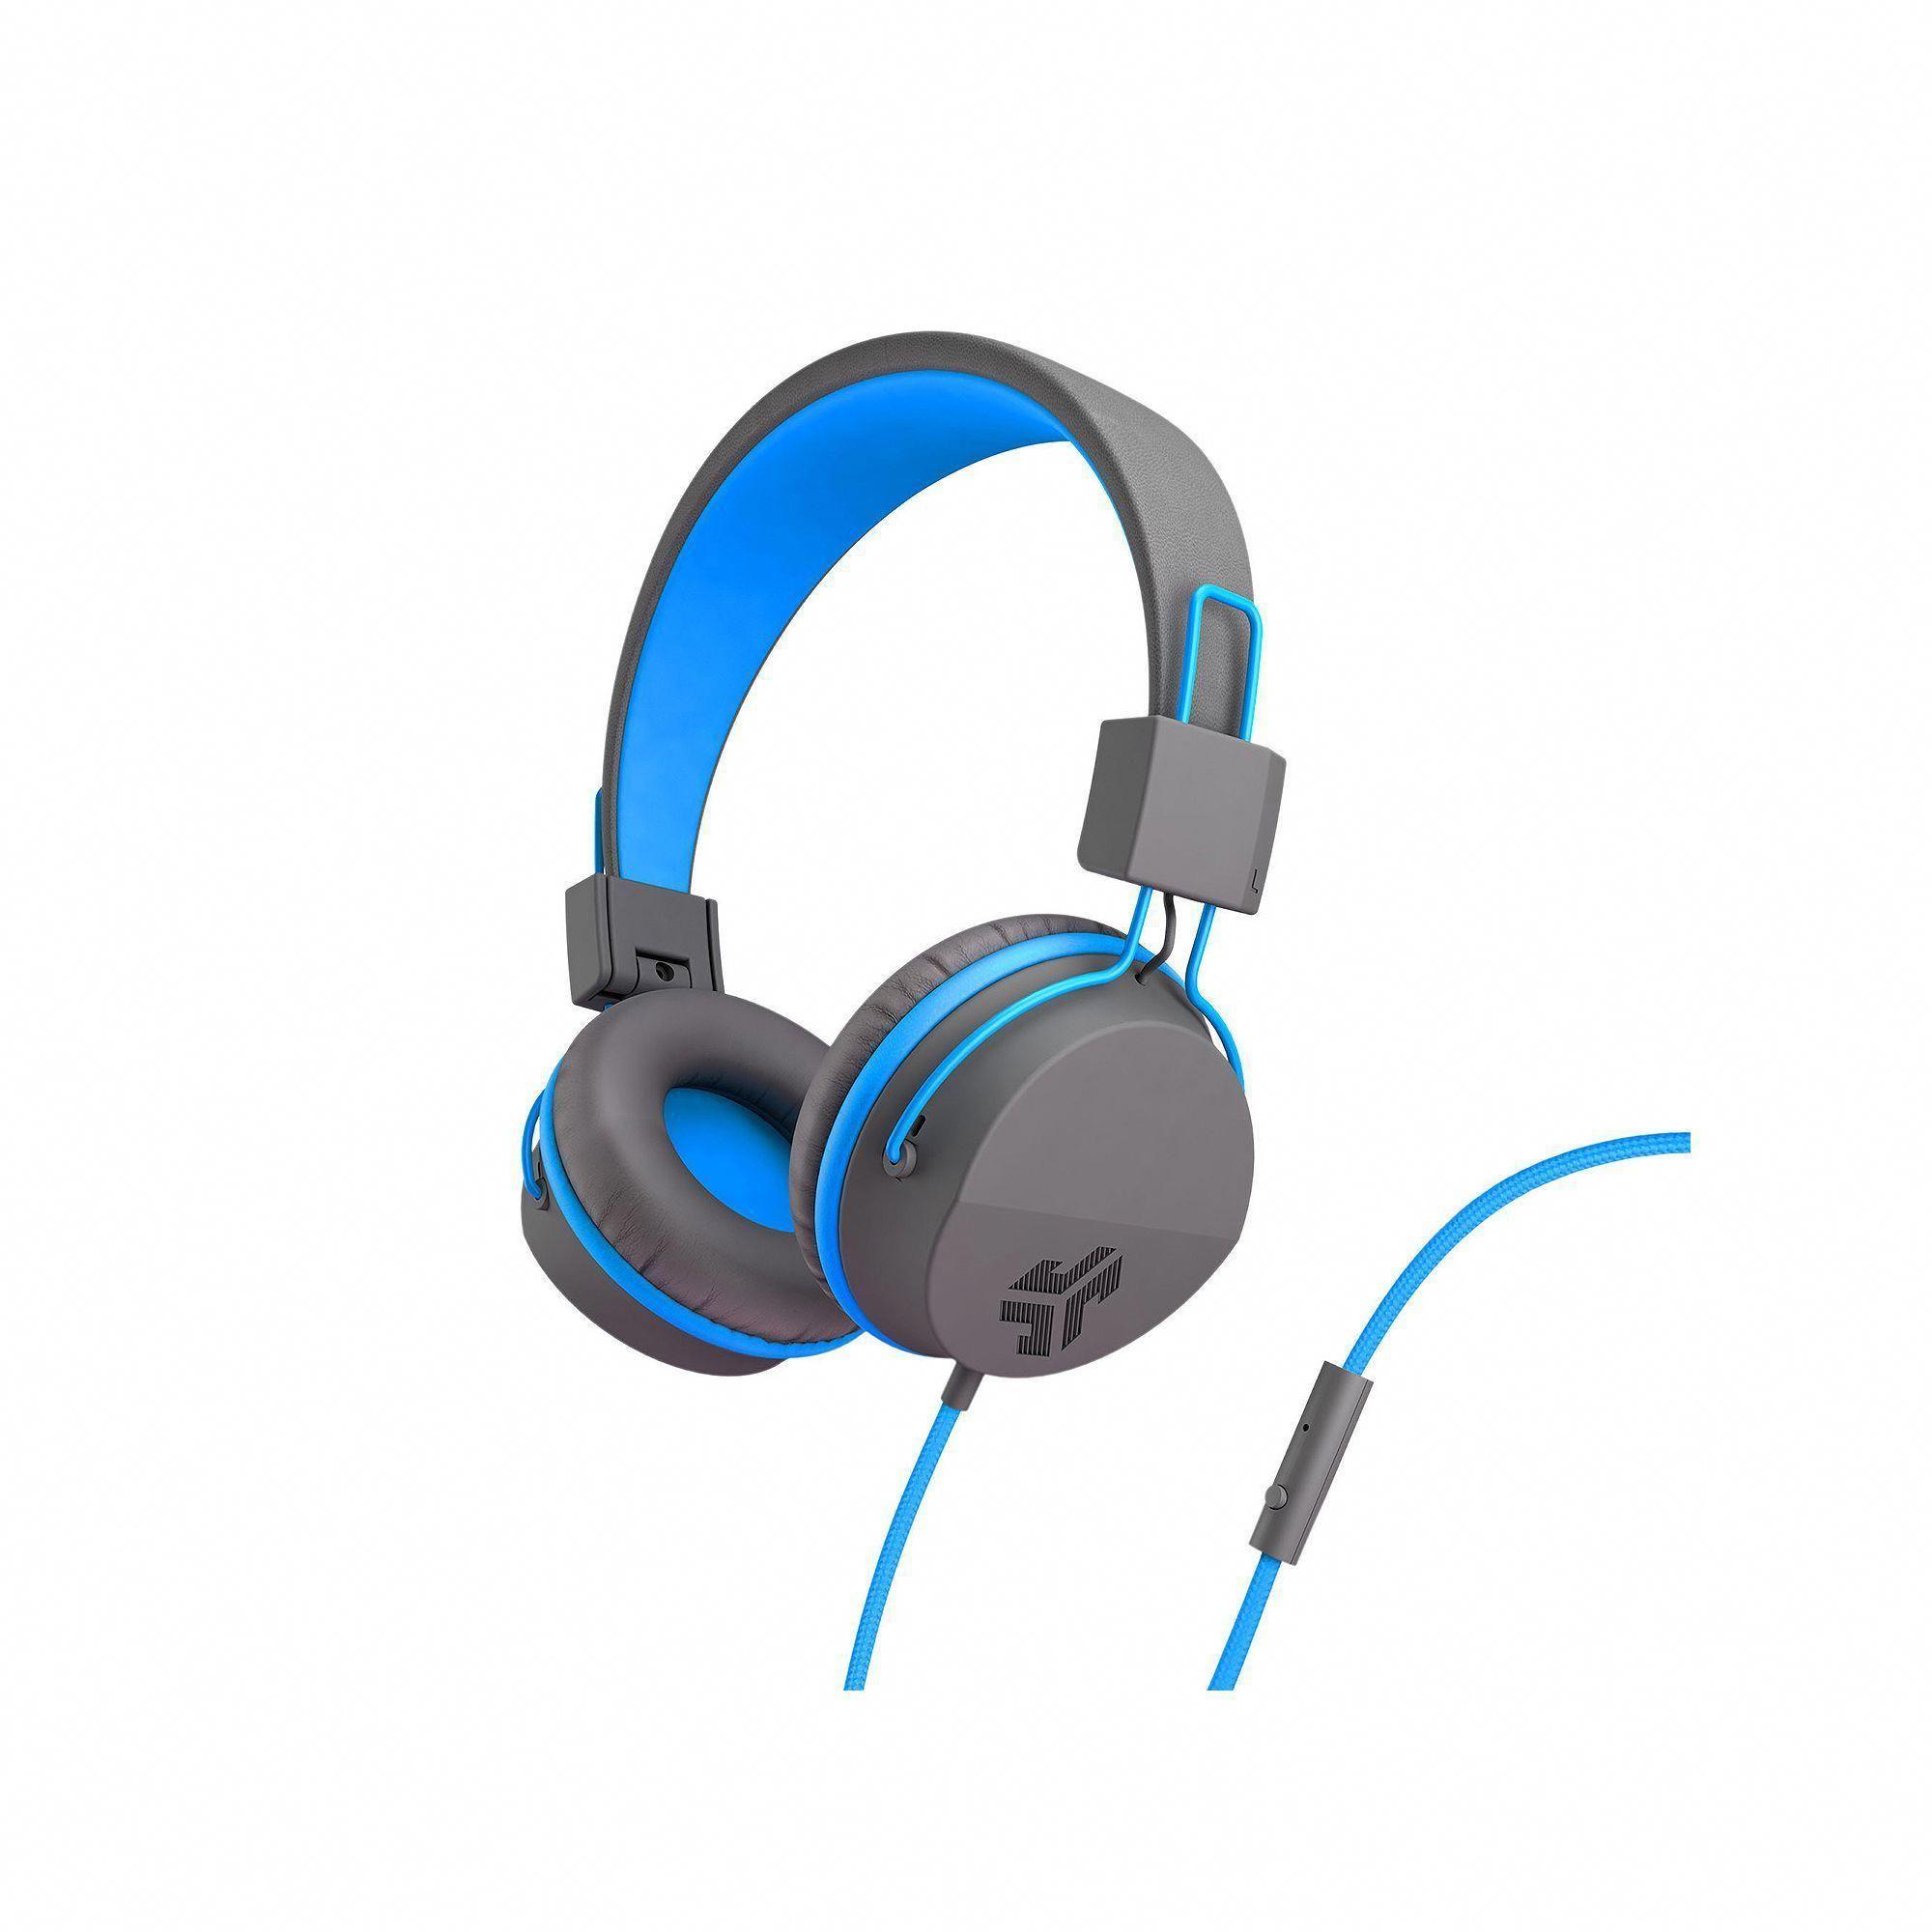 JLab Neon OnEar Headphones with Universal Mic